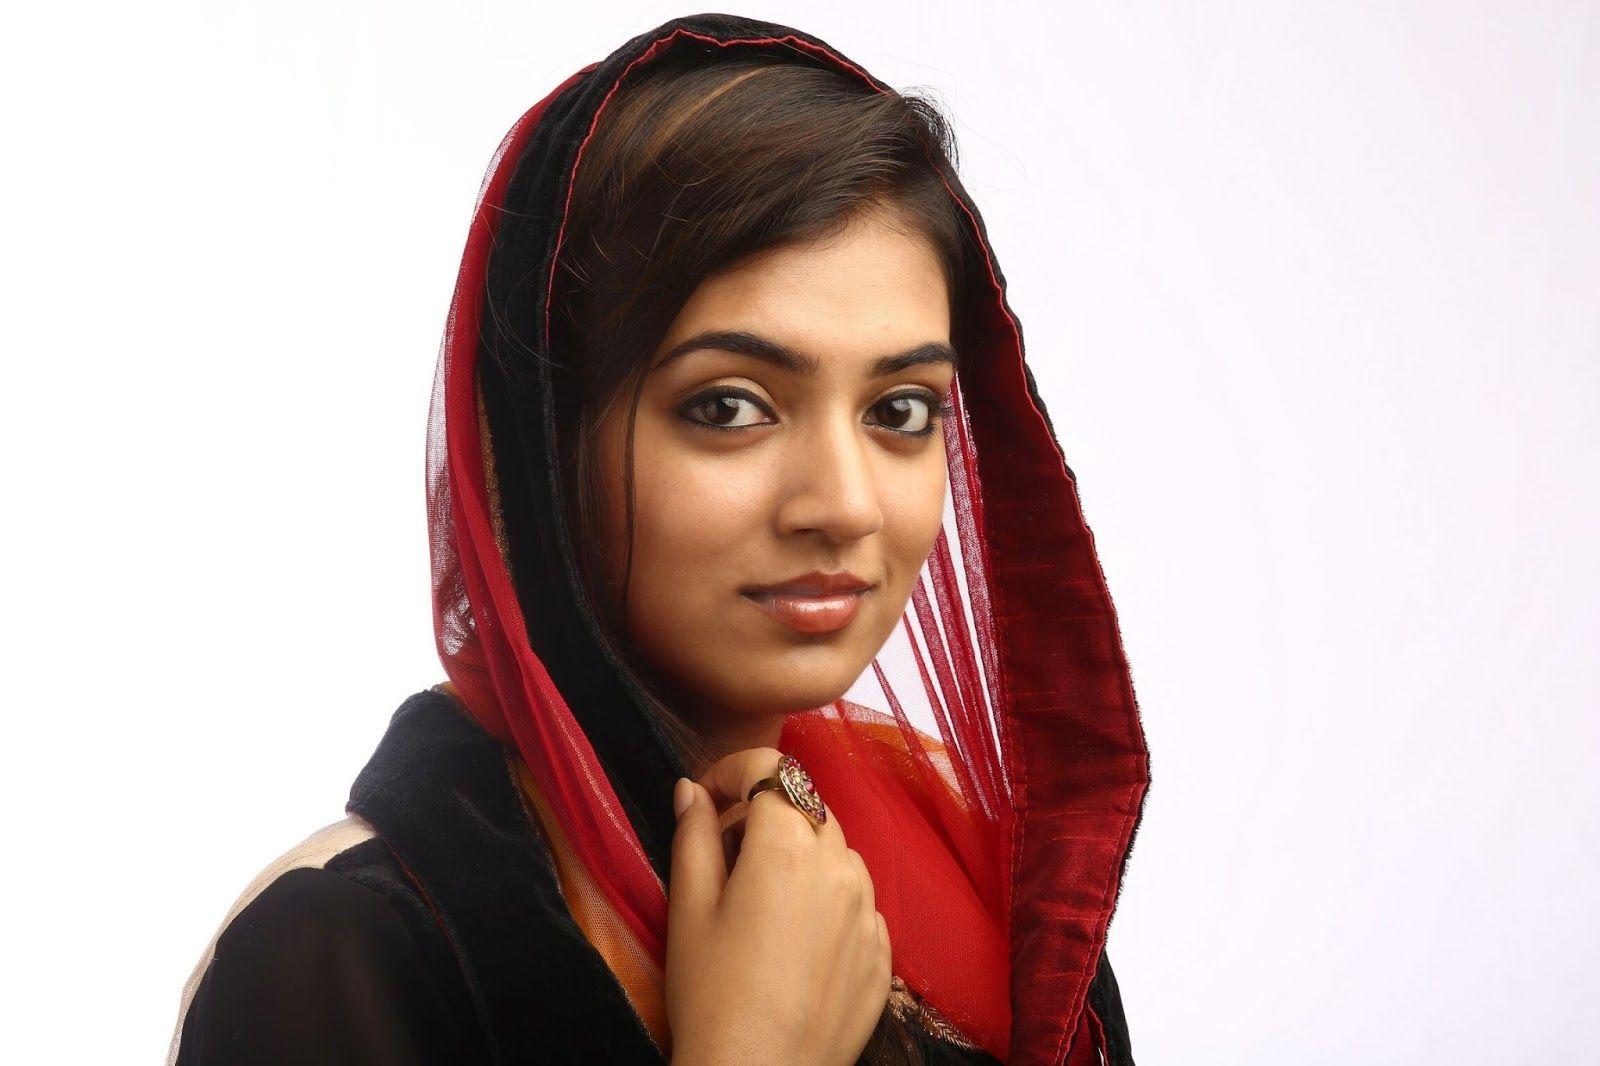 Hd Wallpapers Tamil Heroines Group Actress Wallpaper Actresses Nazriya Nazim